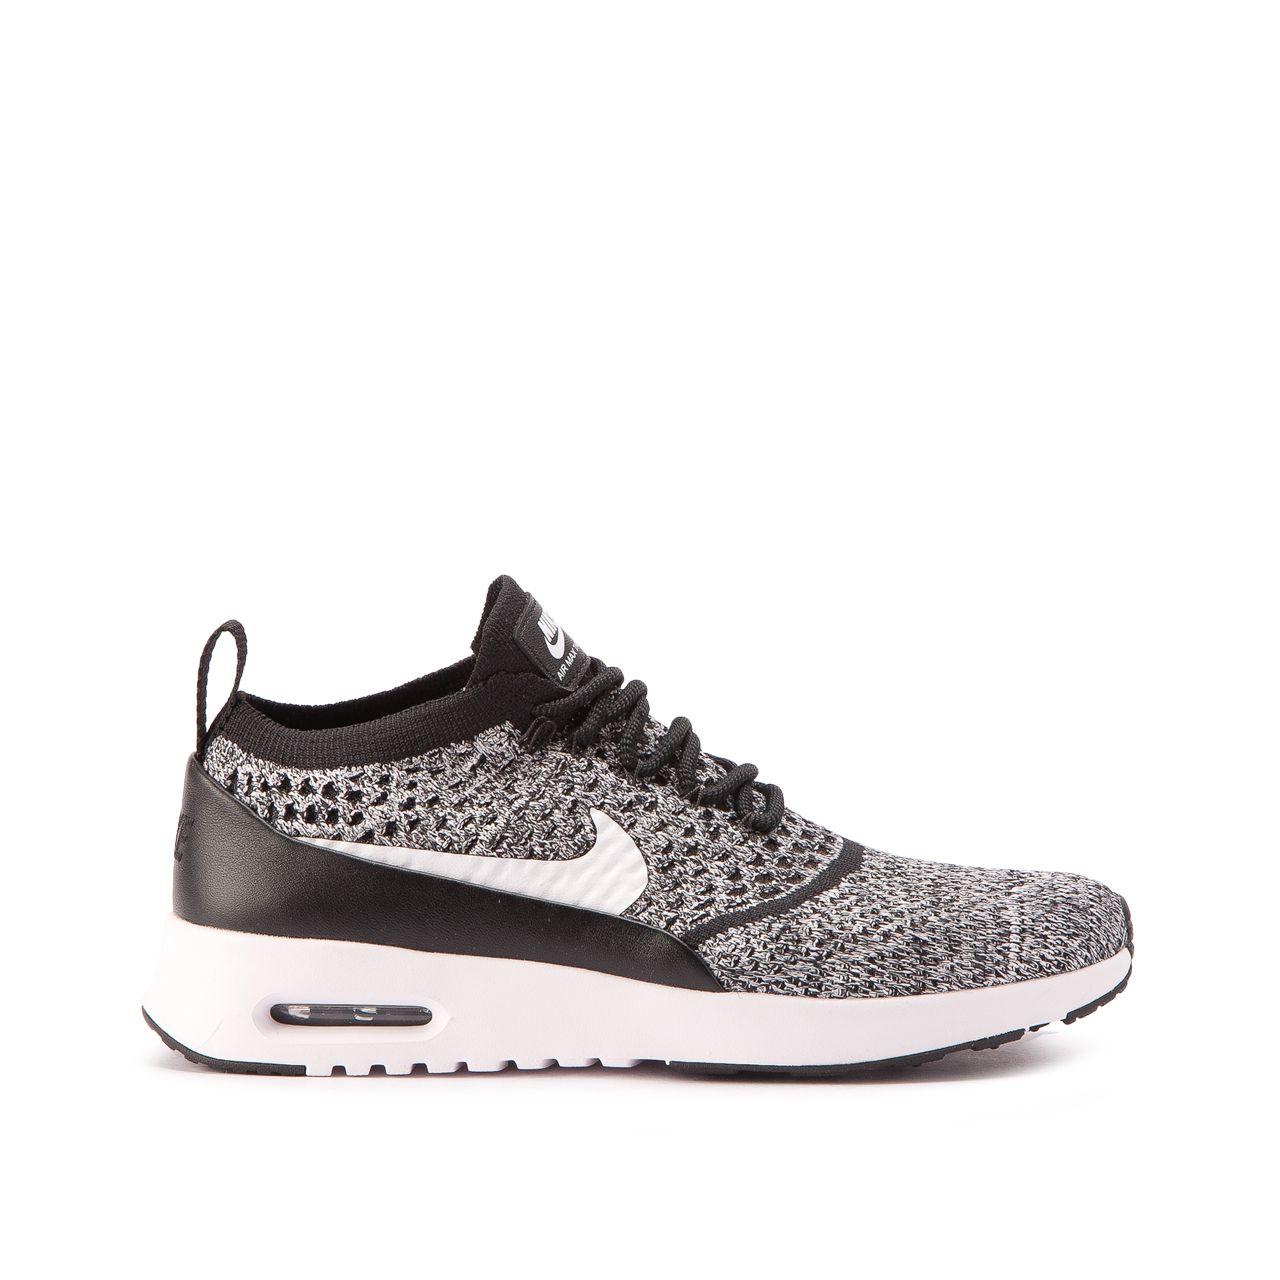 Nike WMNS Air Max Thea Ultra FK (Schwarz / Weiß) #lpu #sneaker